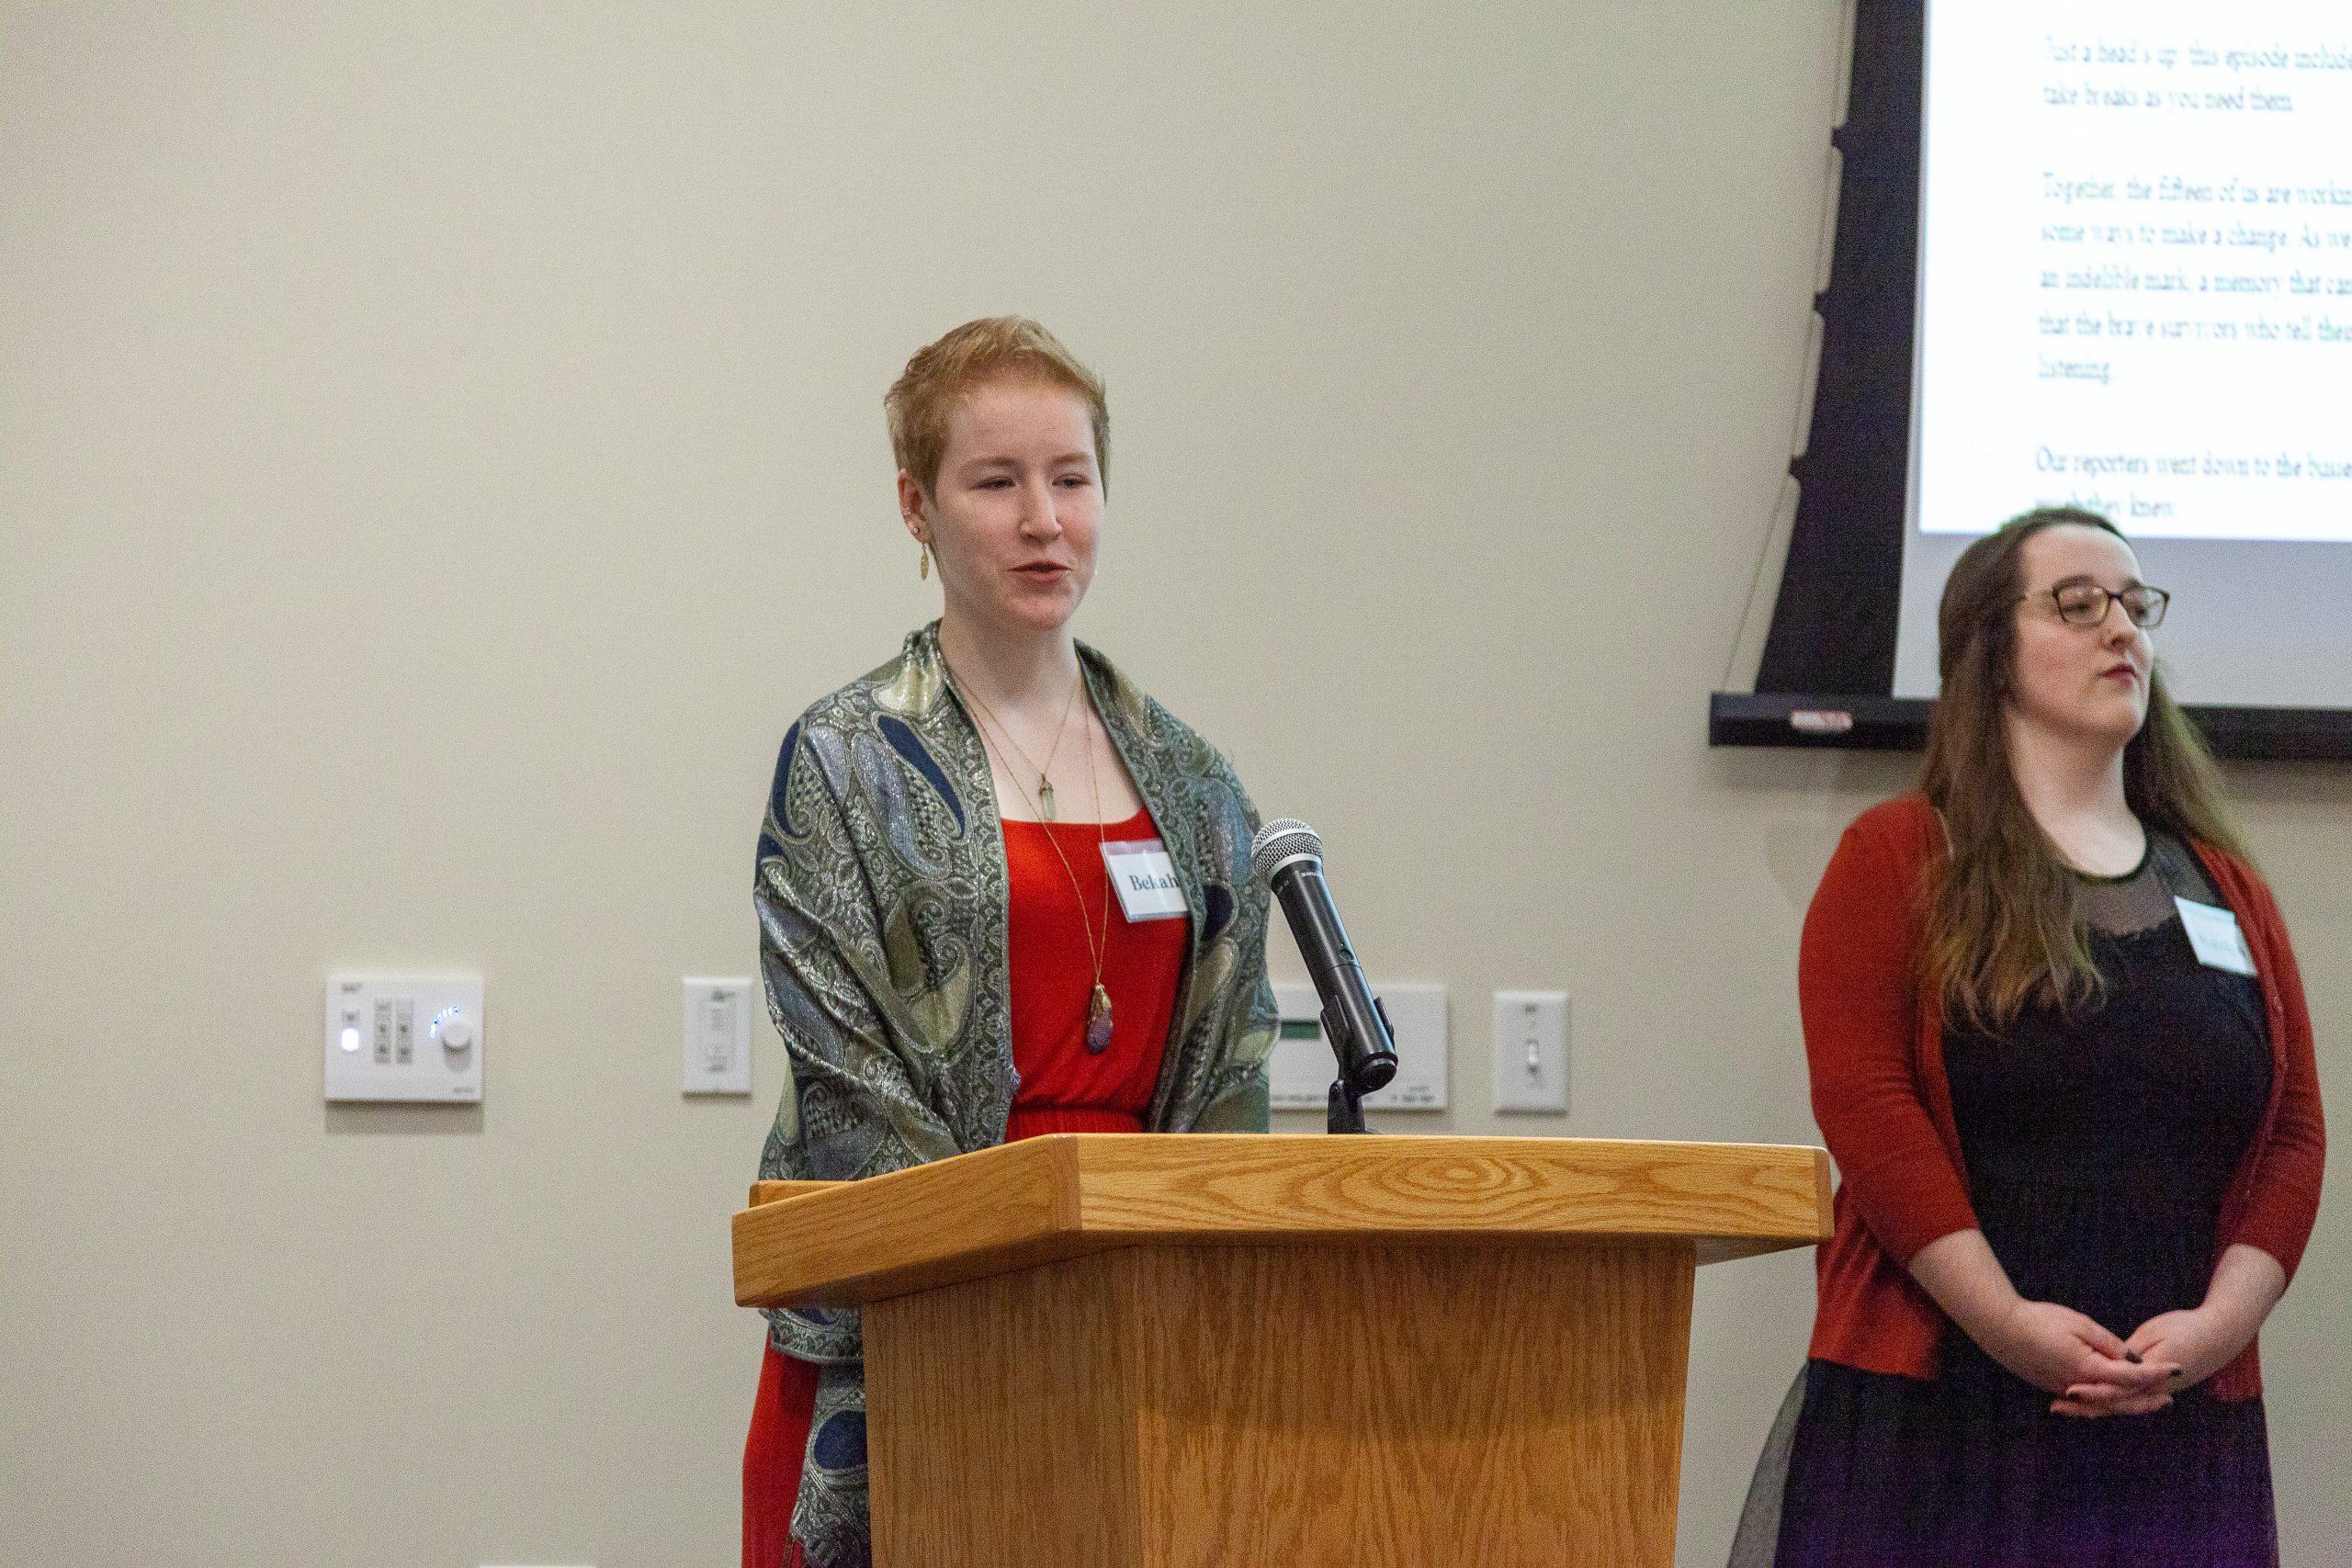 Bekah at the podium.